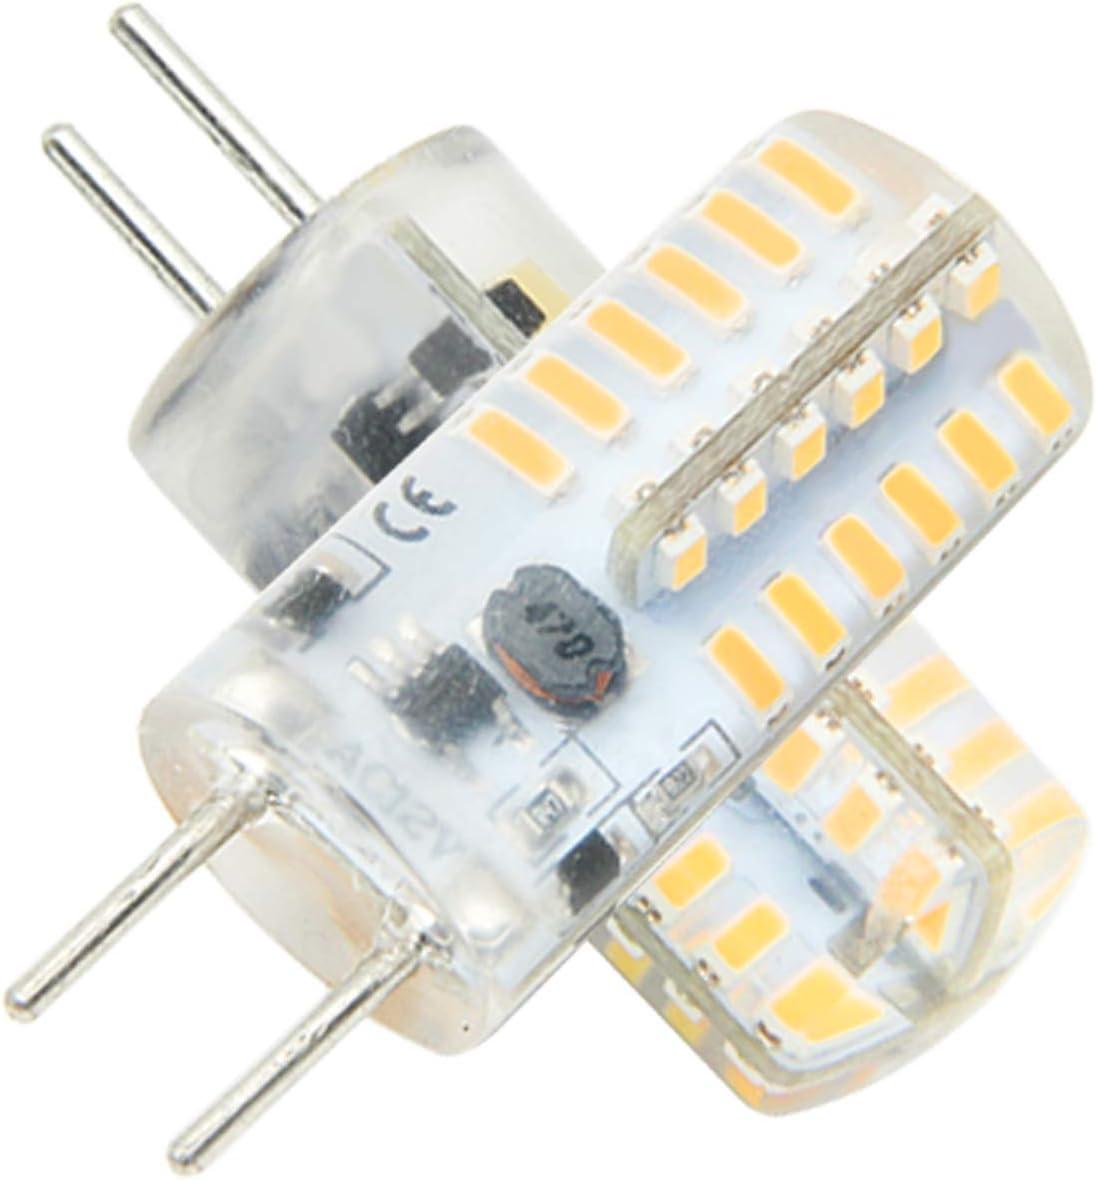 Ymm G6.35 GY6.35 Alto Brillo Bombilla LED 3W Equivalente a Lámpara Halógena de 30W,AC 12V,Blanco Cálida 3000K (5 unidades) [Clase de eficiencia energética A+]